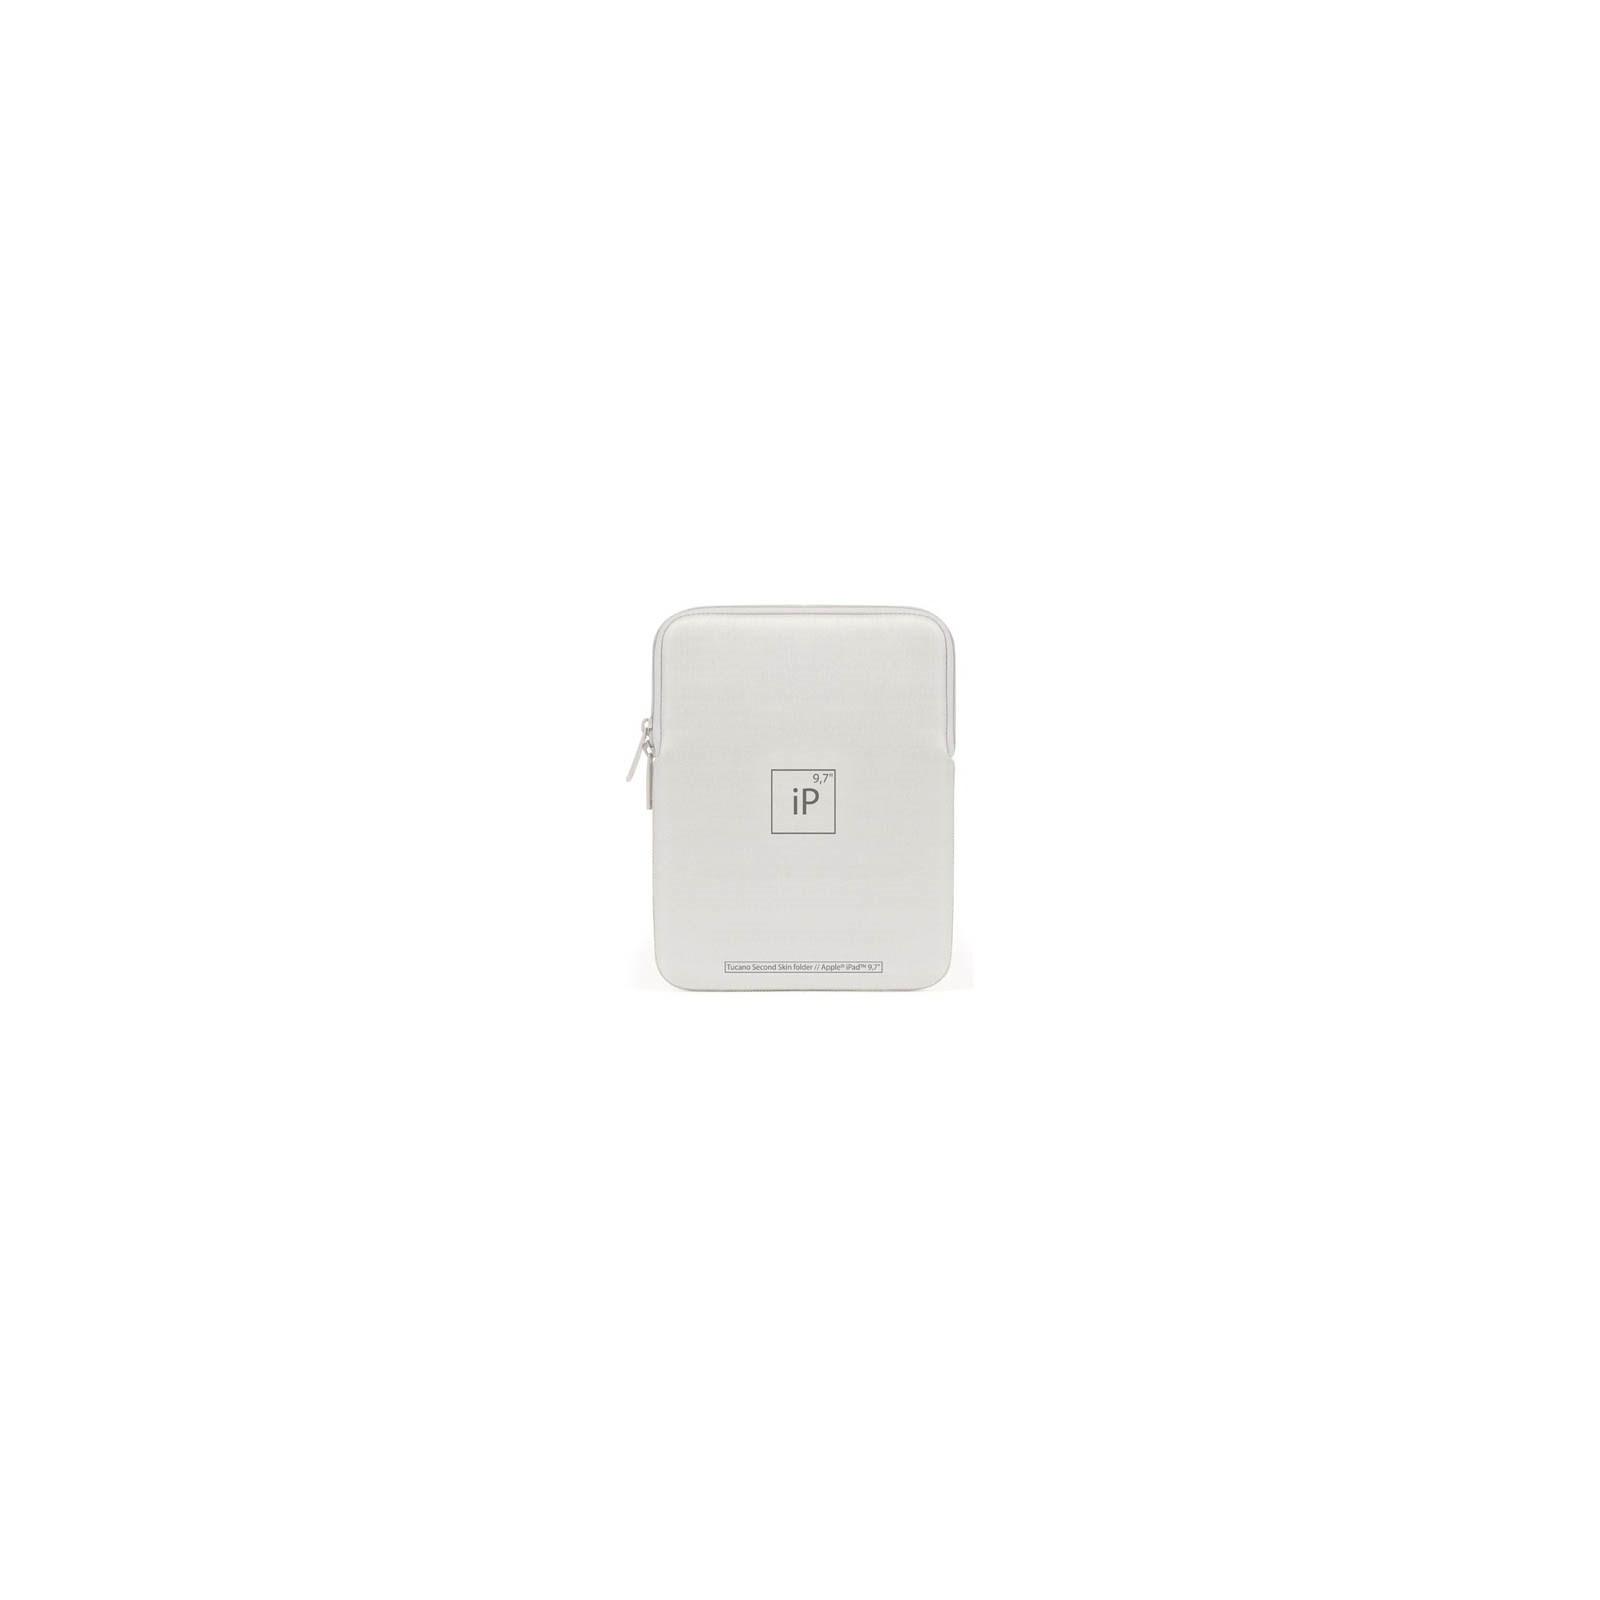 "Чехол для планшета Tucano 9.7"" iPad Elements SE (BF-NU-IP-I)"